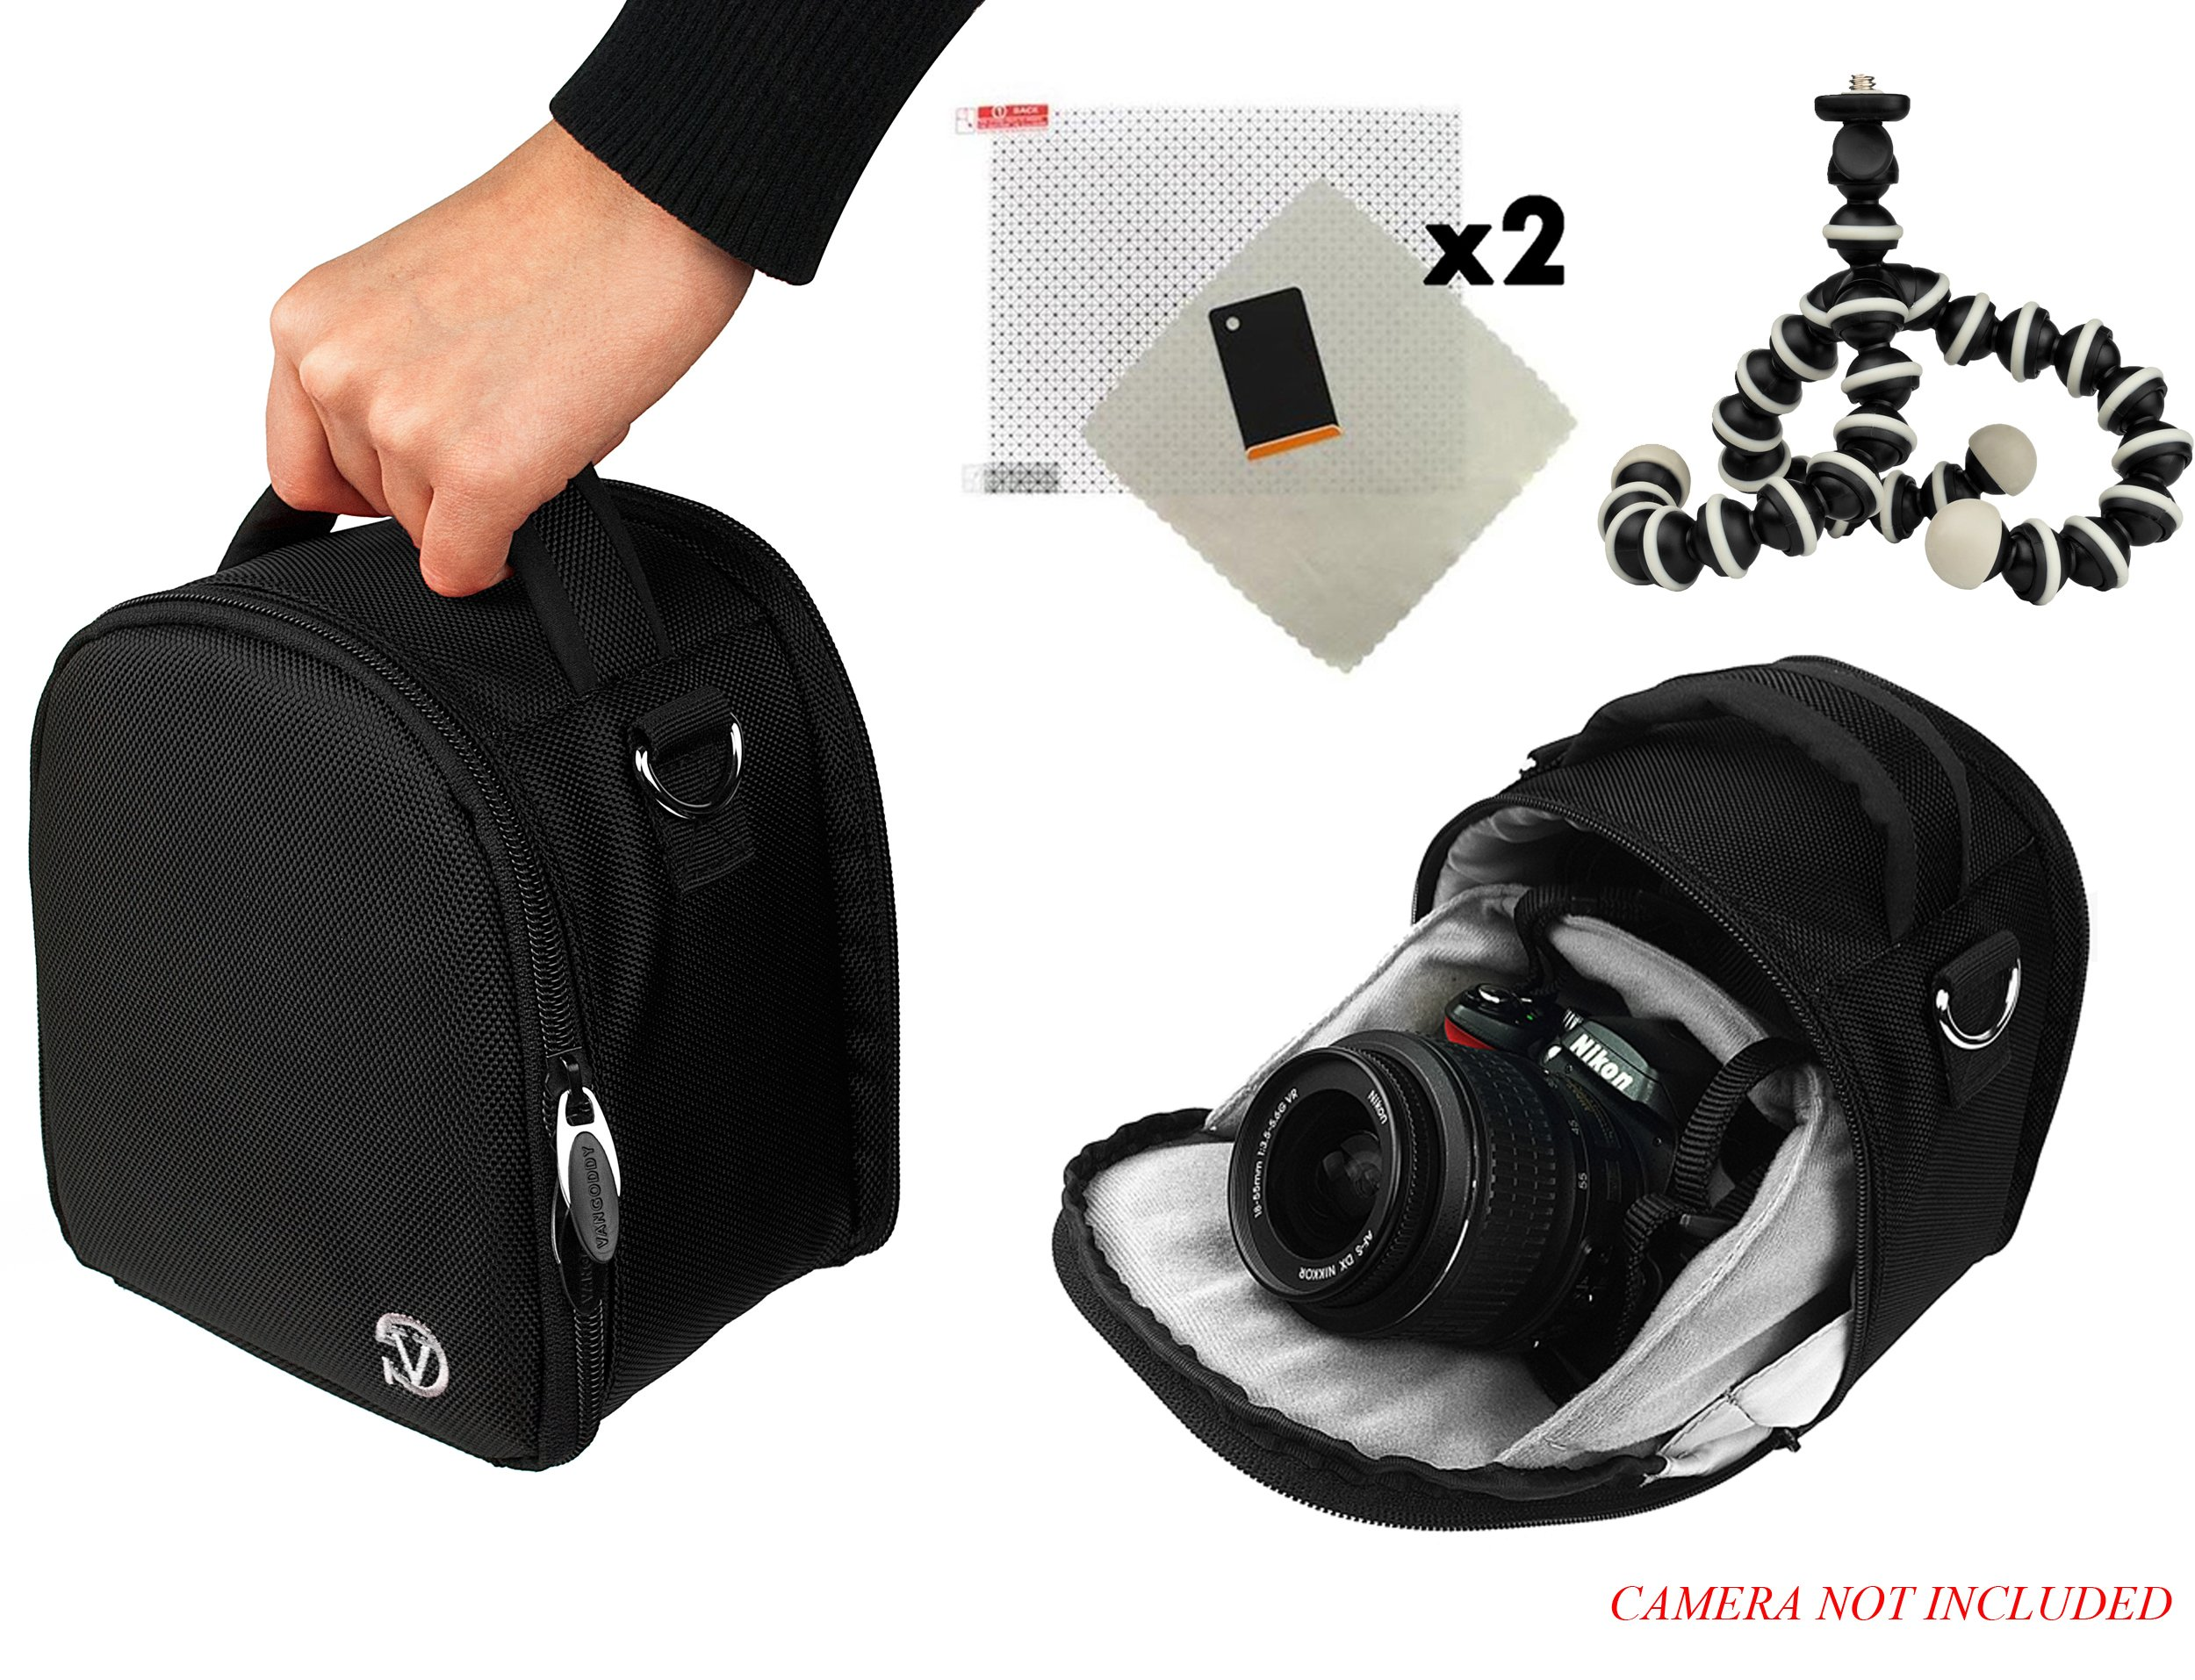 Vangoddy Laurel Travel Camera Bag Case For Canon EOS 1000D (Rebel XS/Kiss F), 100D (Rebel SL1), 10D, 1100D (Rebel T3/Kiss X50) DSLR Camera + Screen Protector + Screen Protector + Mini Tripod